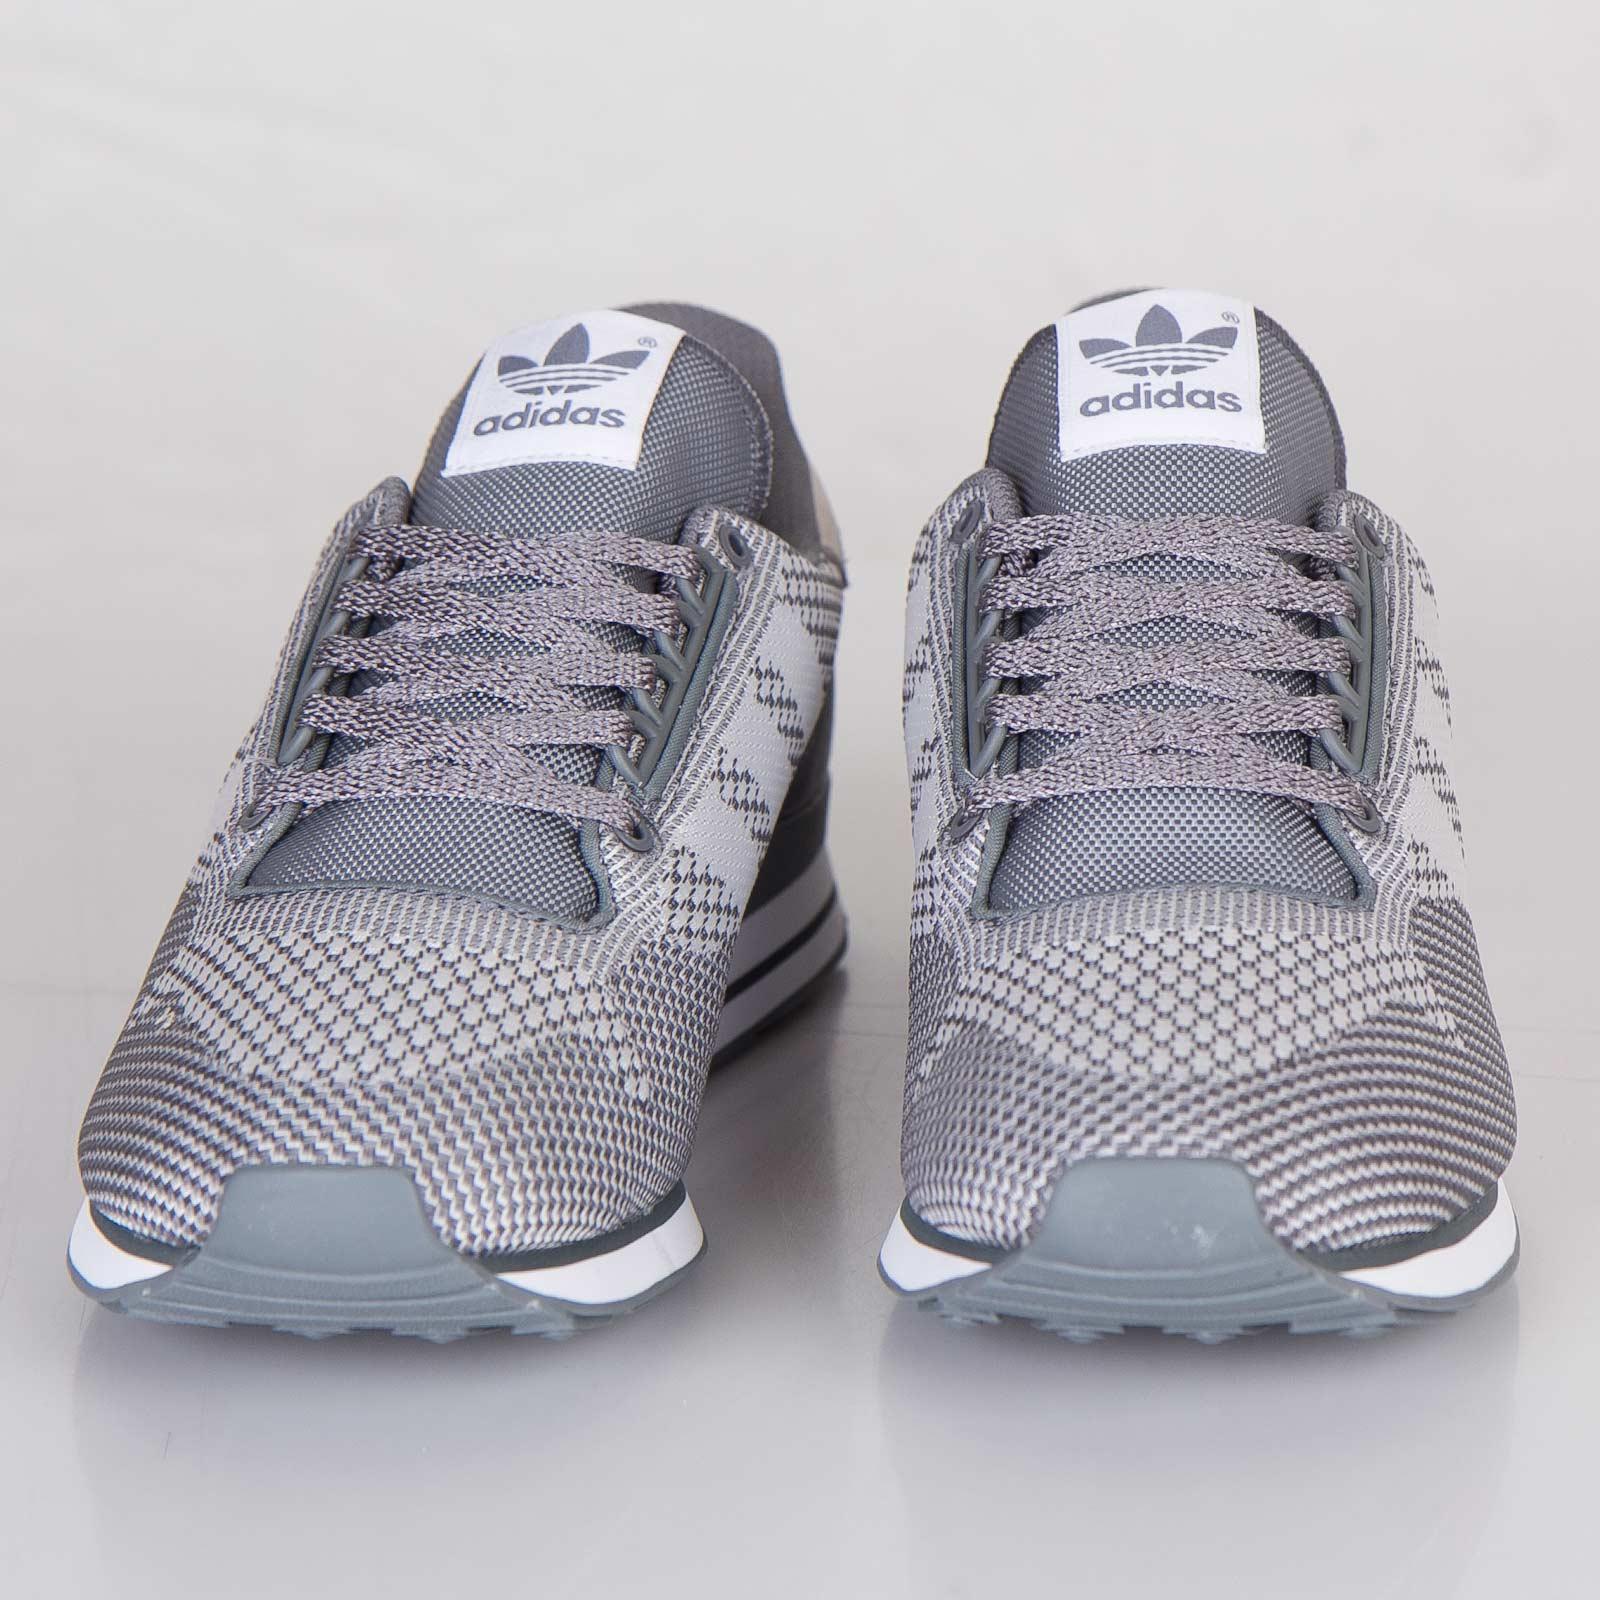 0b76cc552 adidas ZX 500 OG Weave - M20995 - Sneakersnstuff